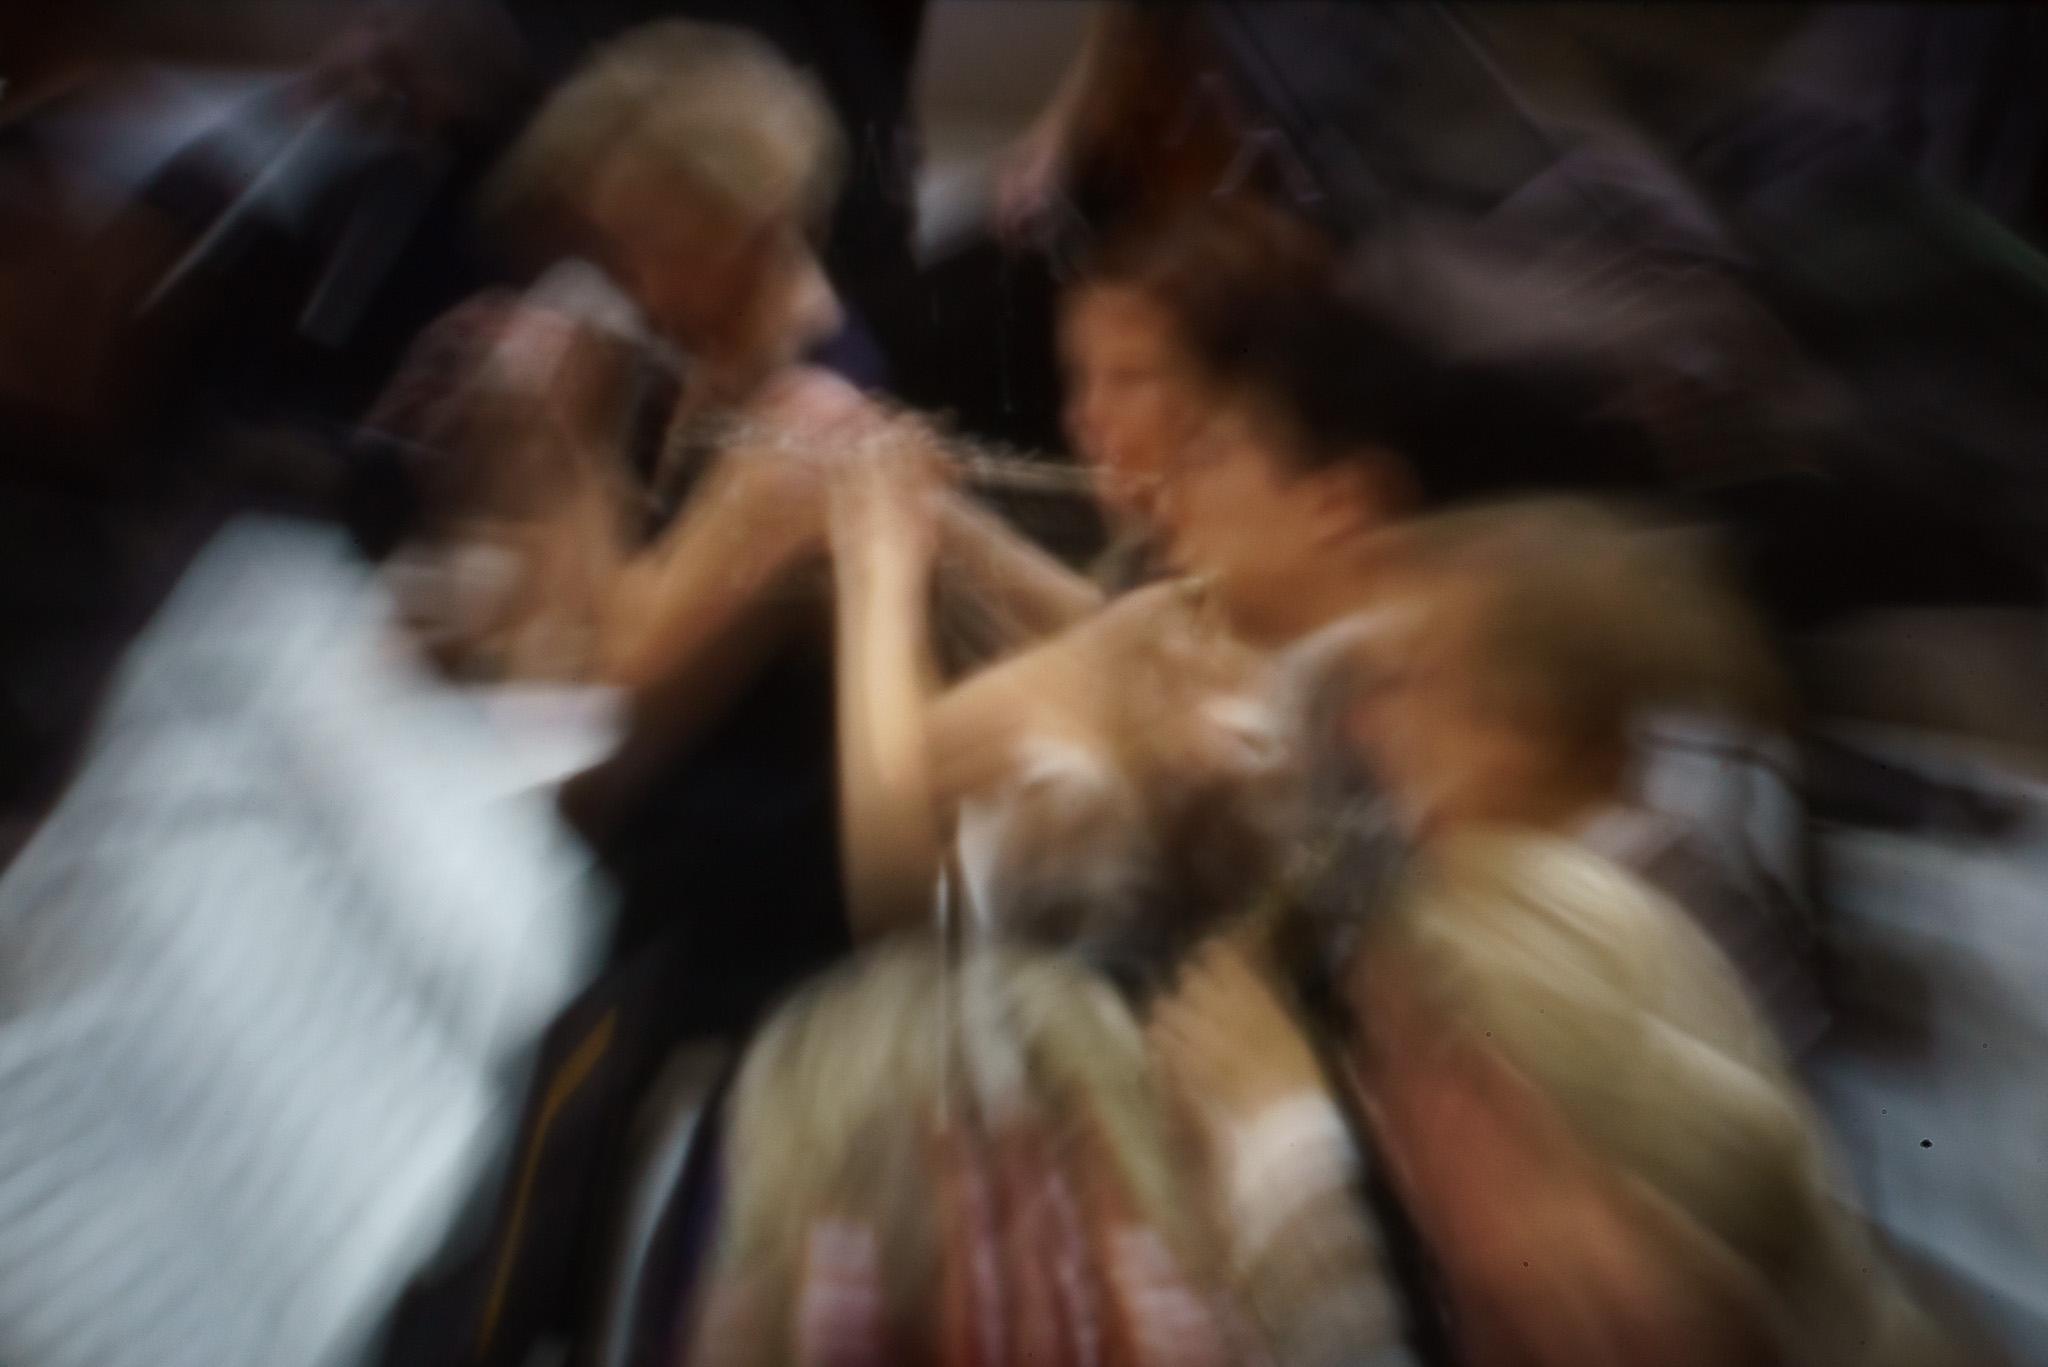 Concerto_Grosso_(11_von_16)